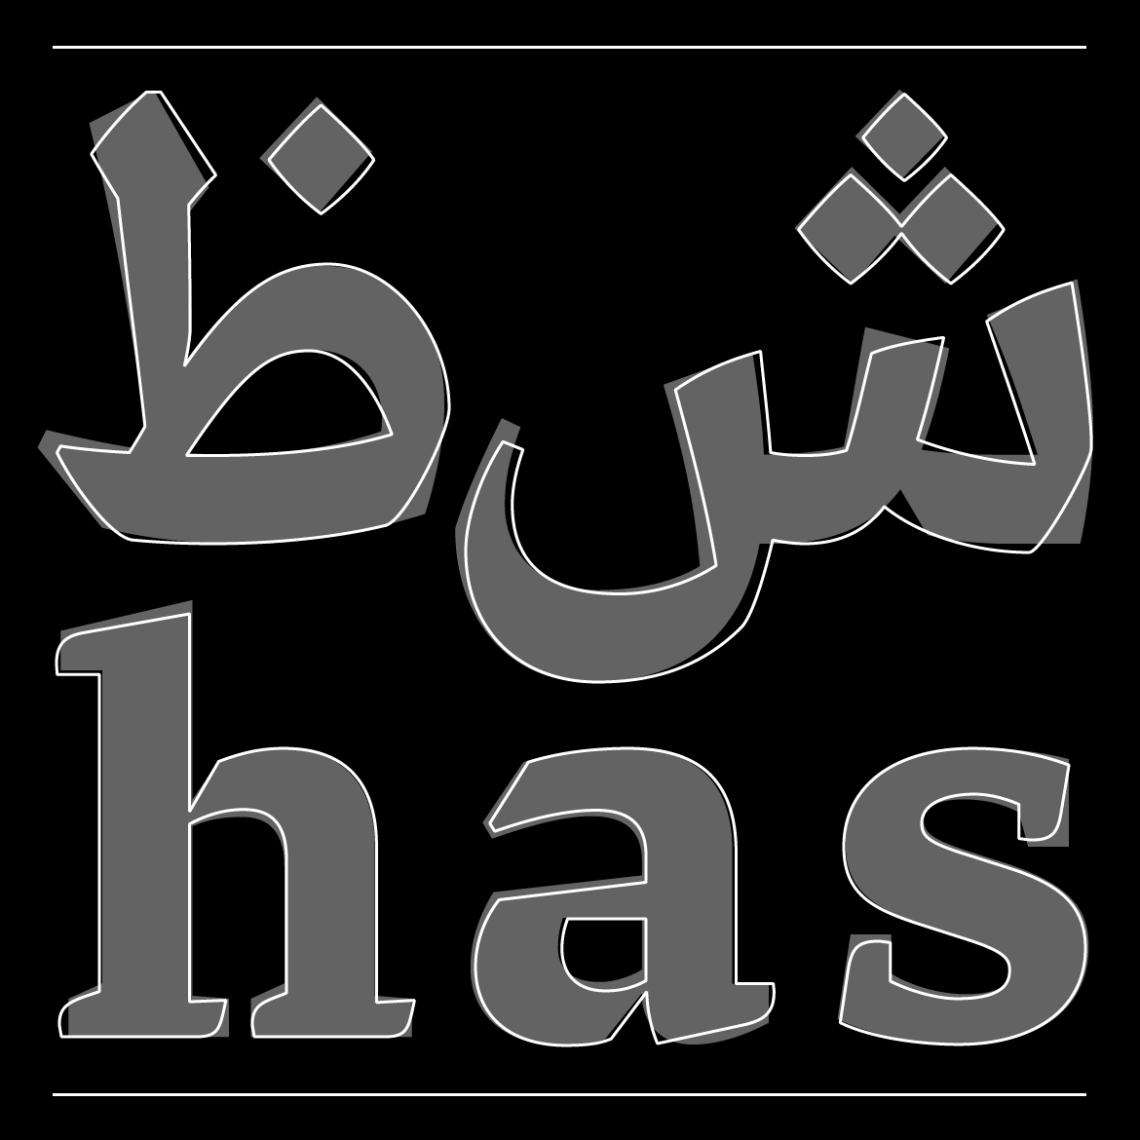 29LT-Zarid-Text-Image-19